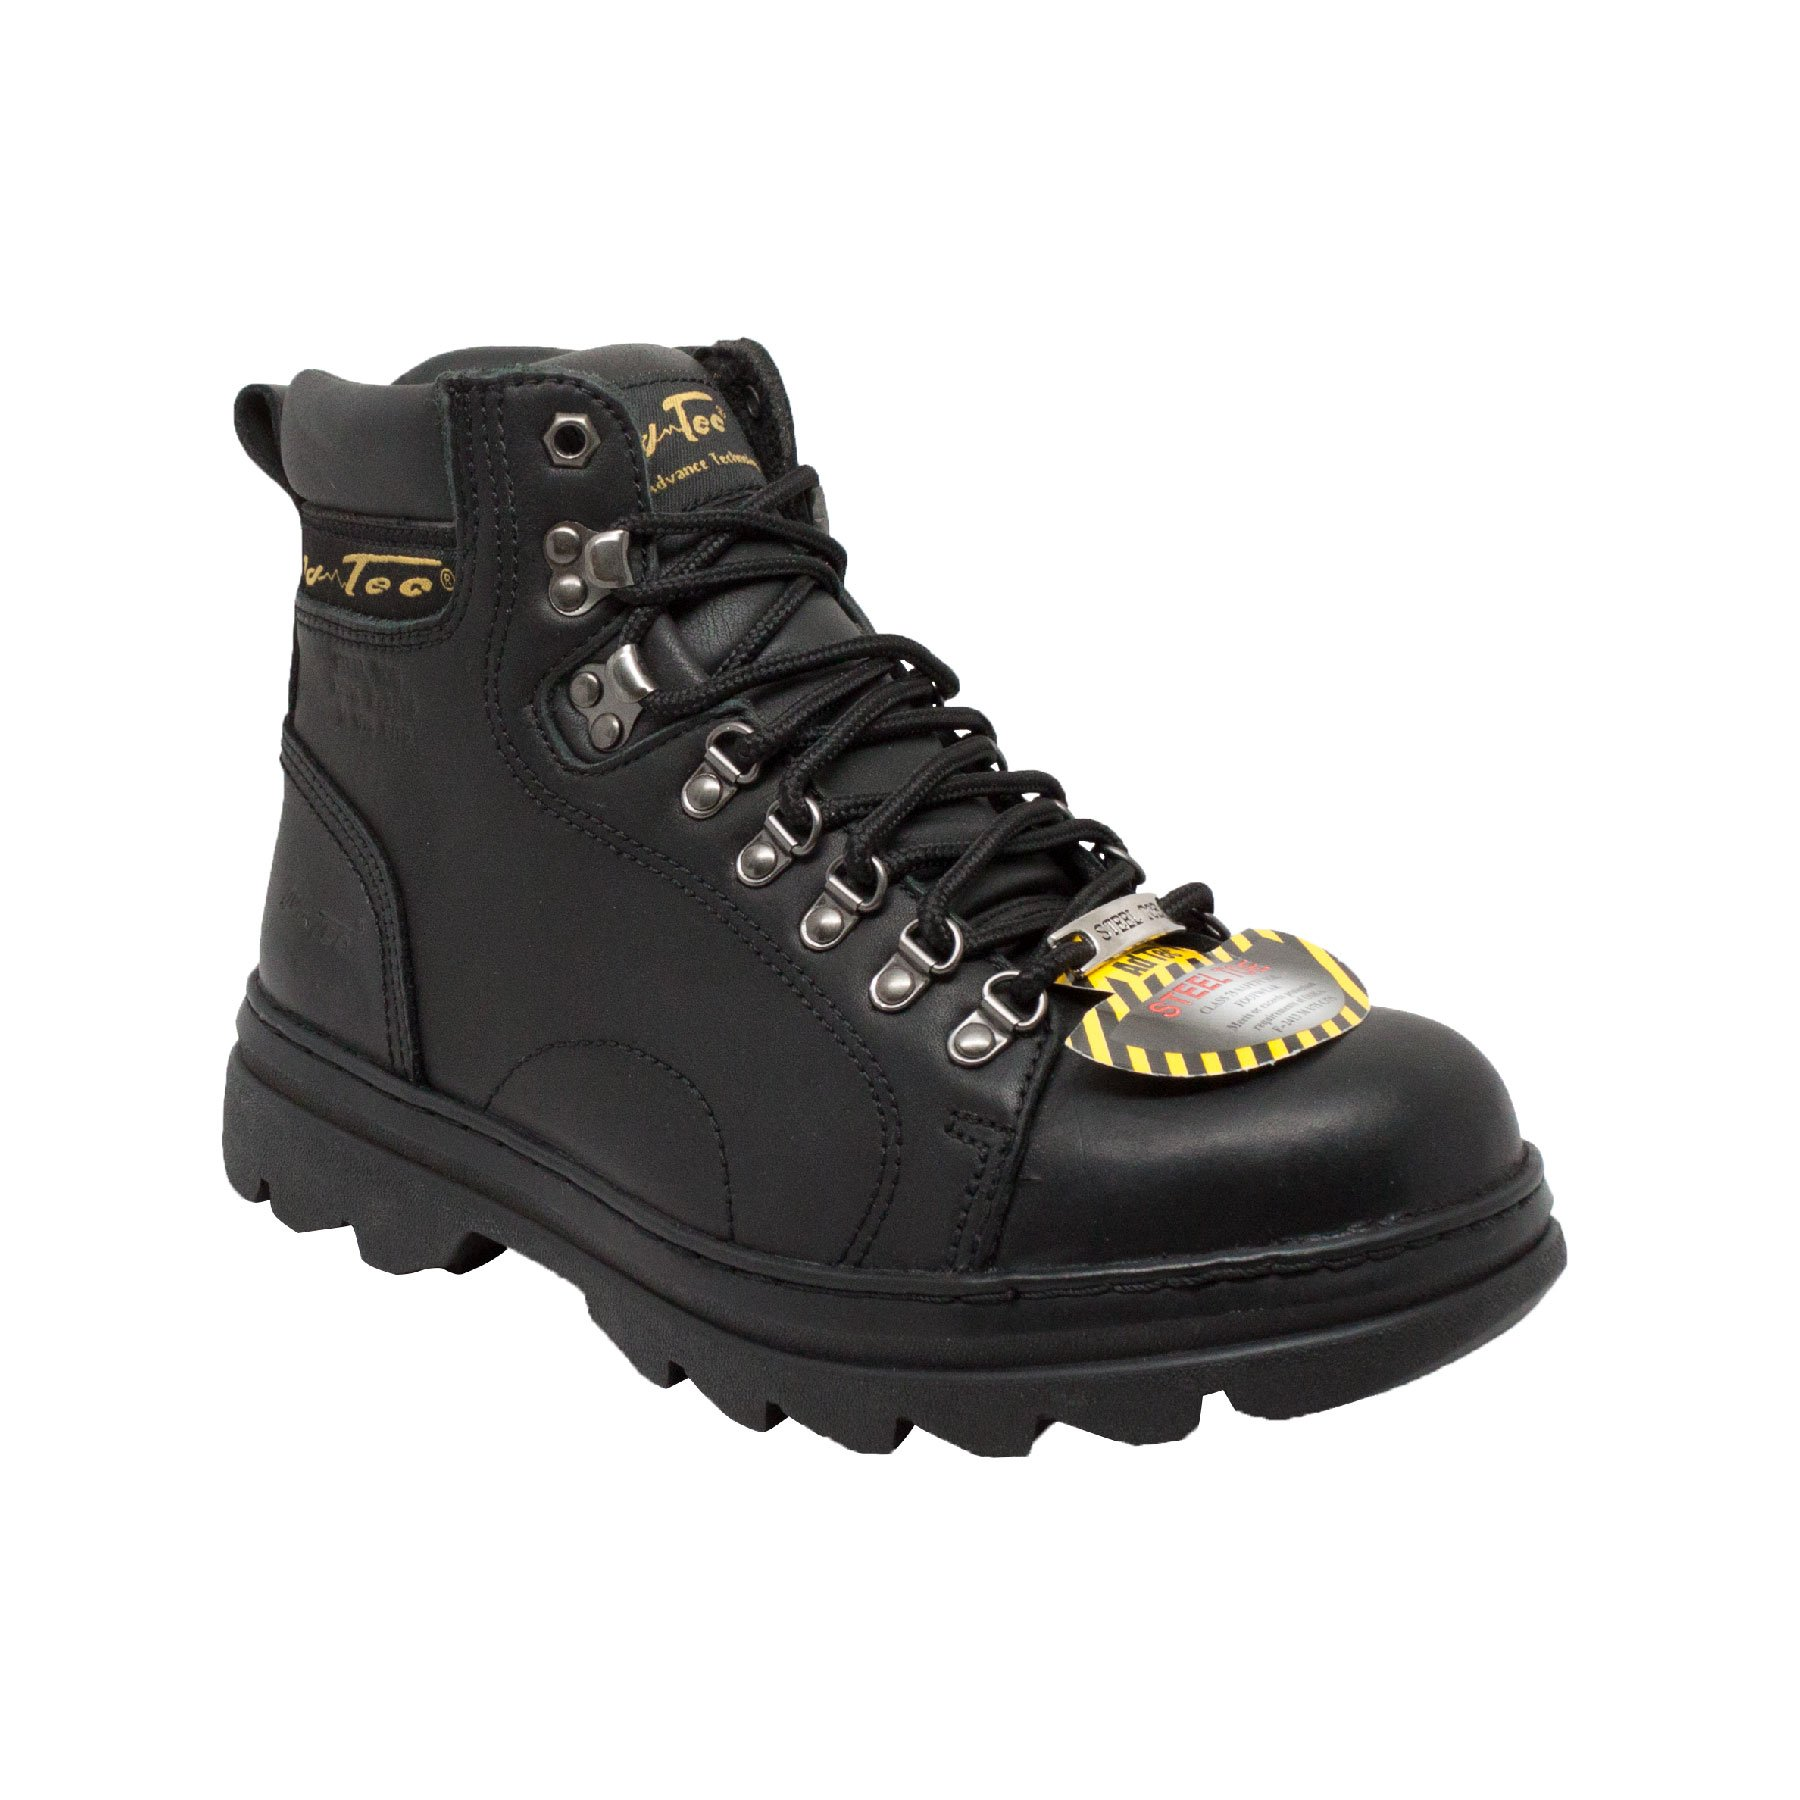 Adtec Men's 6 inch Steel Toe M Work Hiker, Black, 14 W US